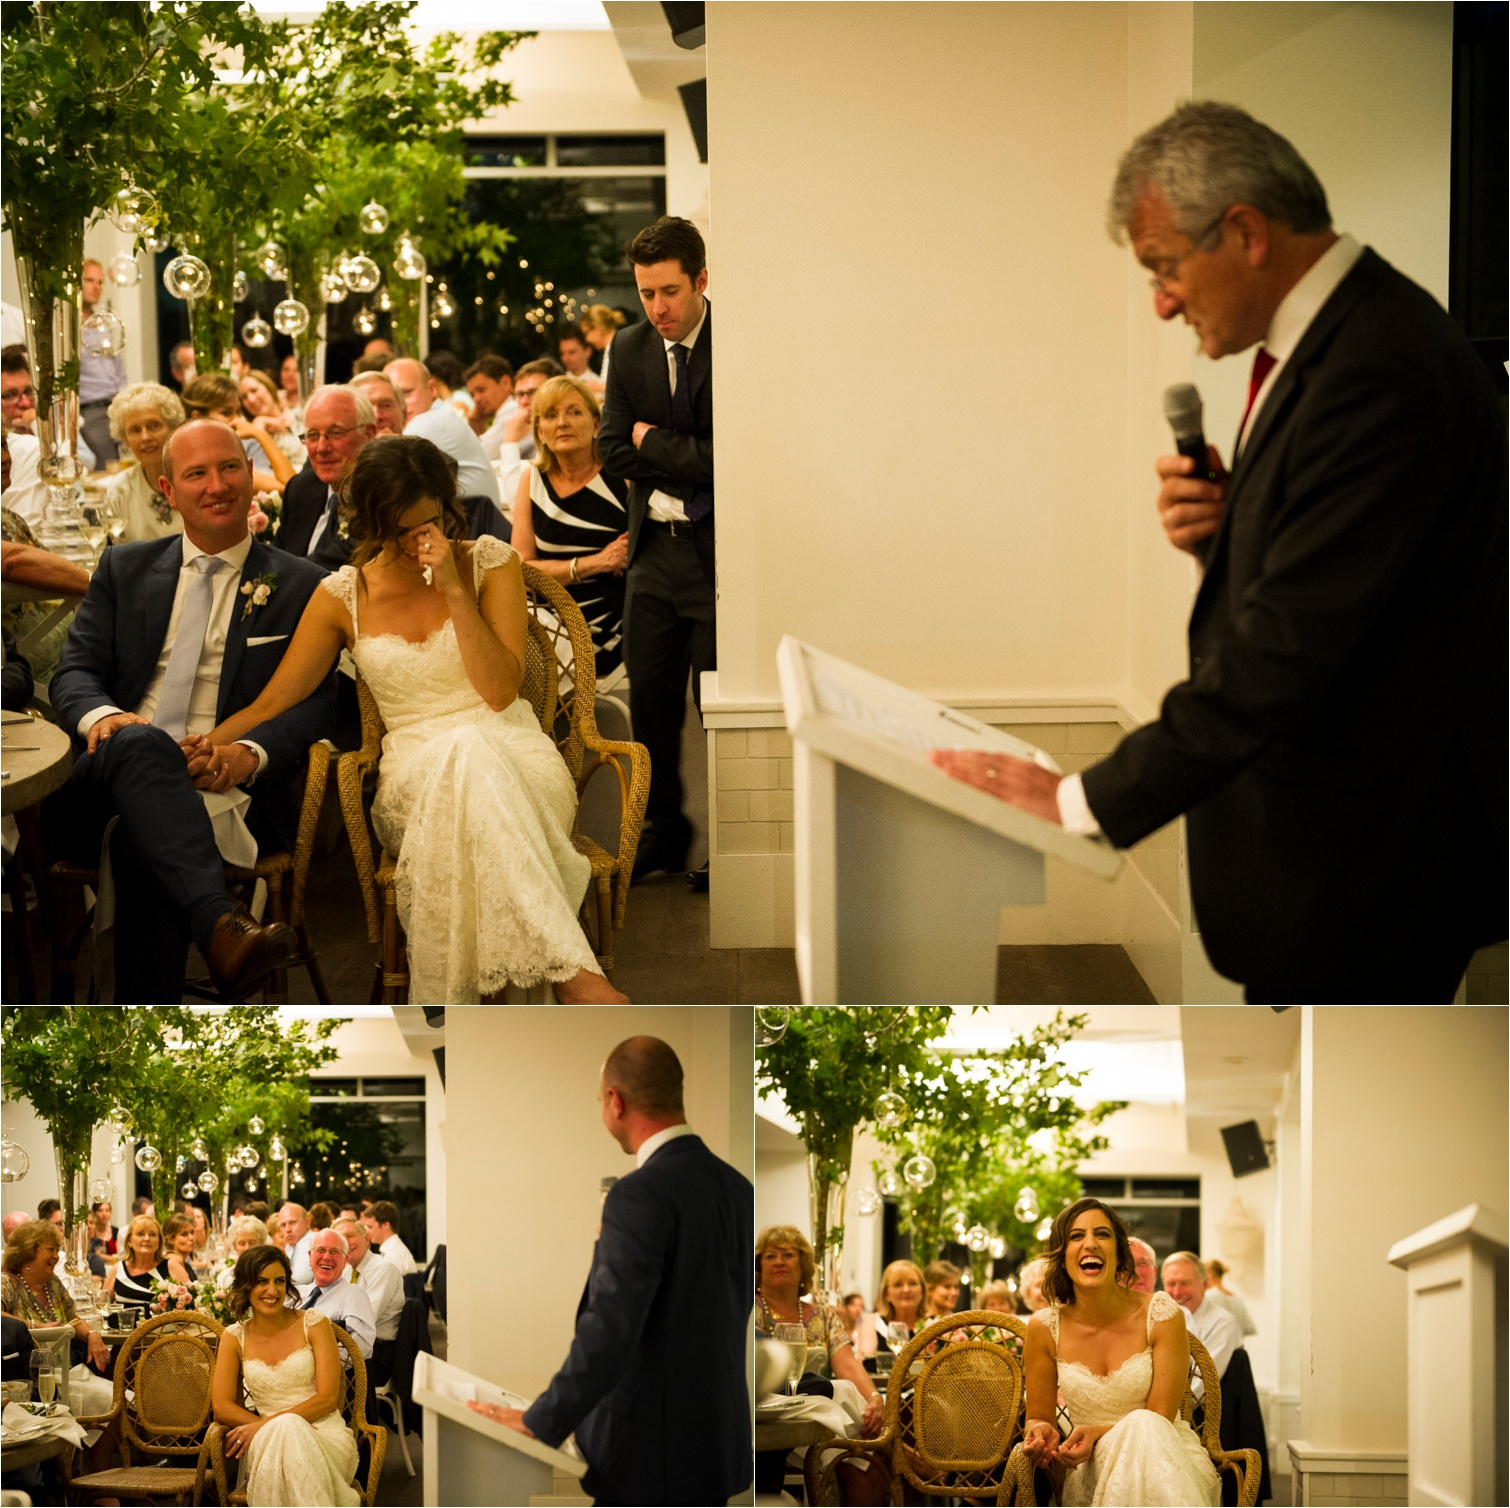 Nicole&Carlie_Watsons_Bay_Hotel_Wedding_by_Gold_Coast_Photographers-The_Follans56.jpg